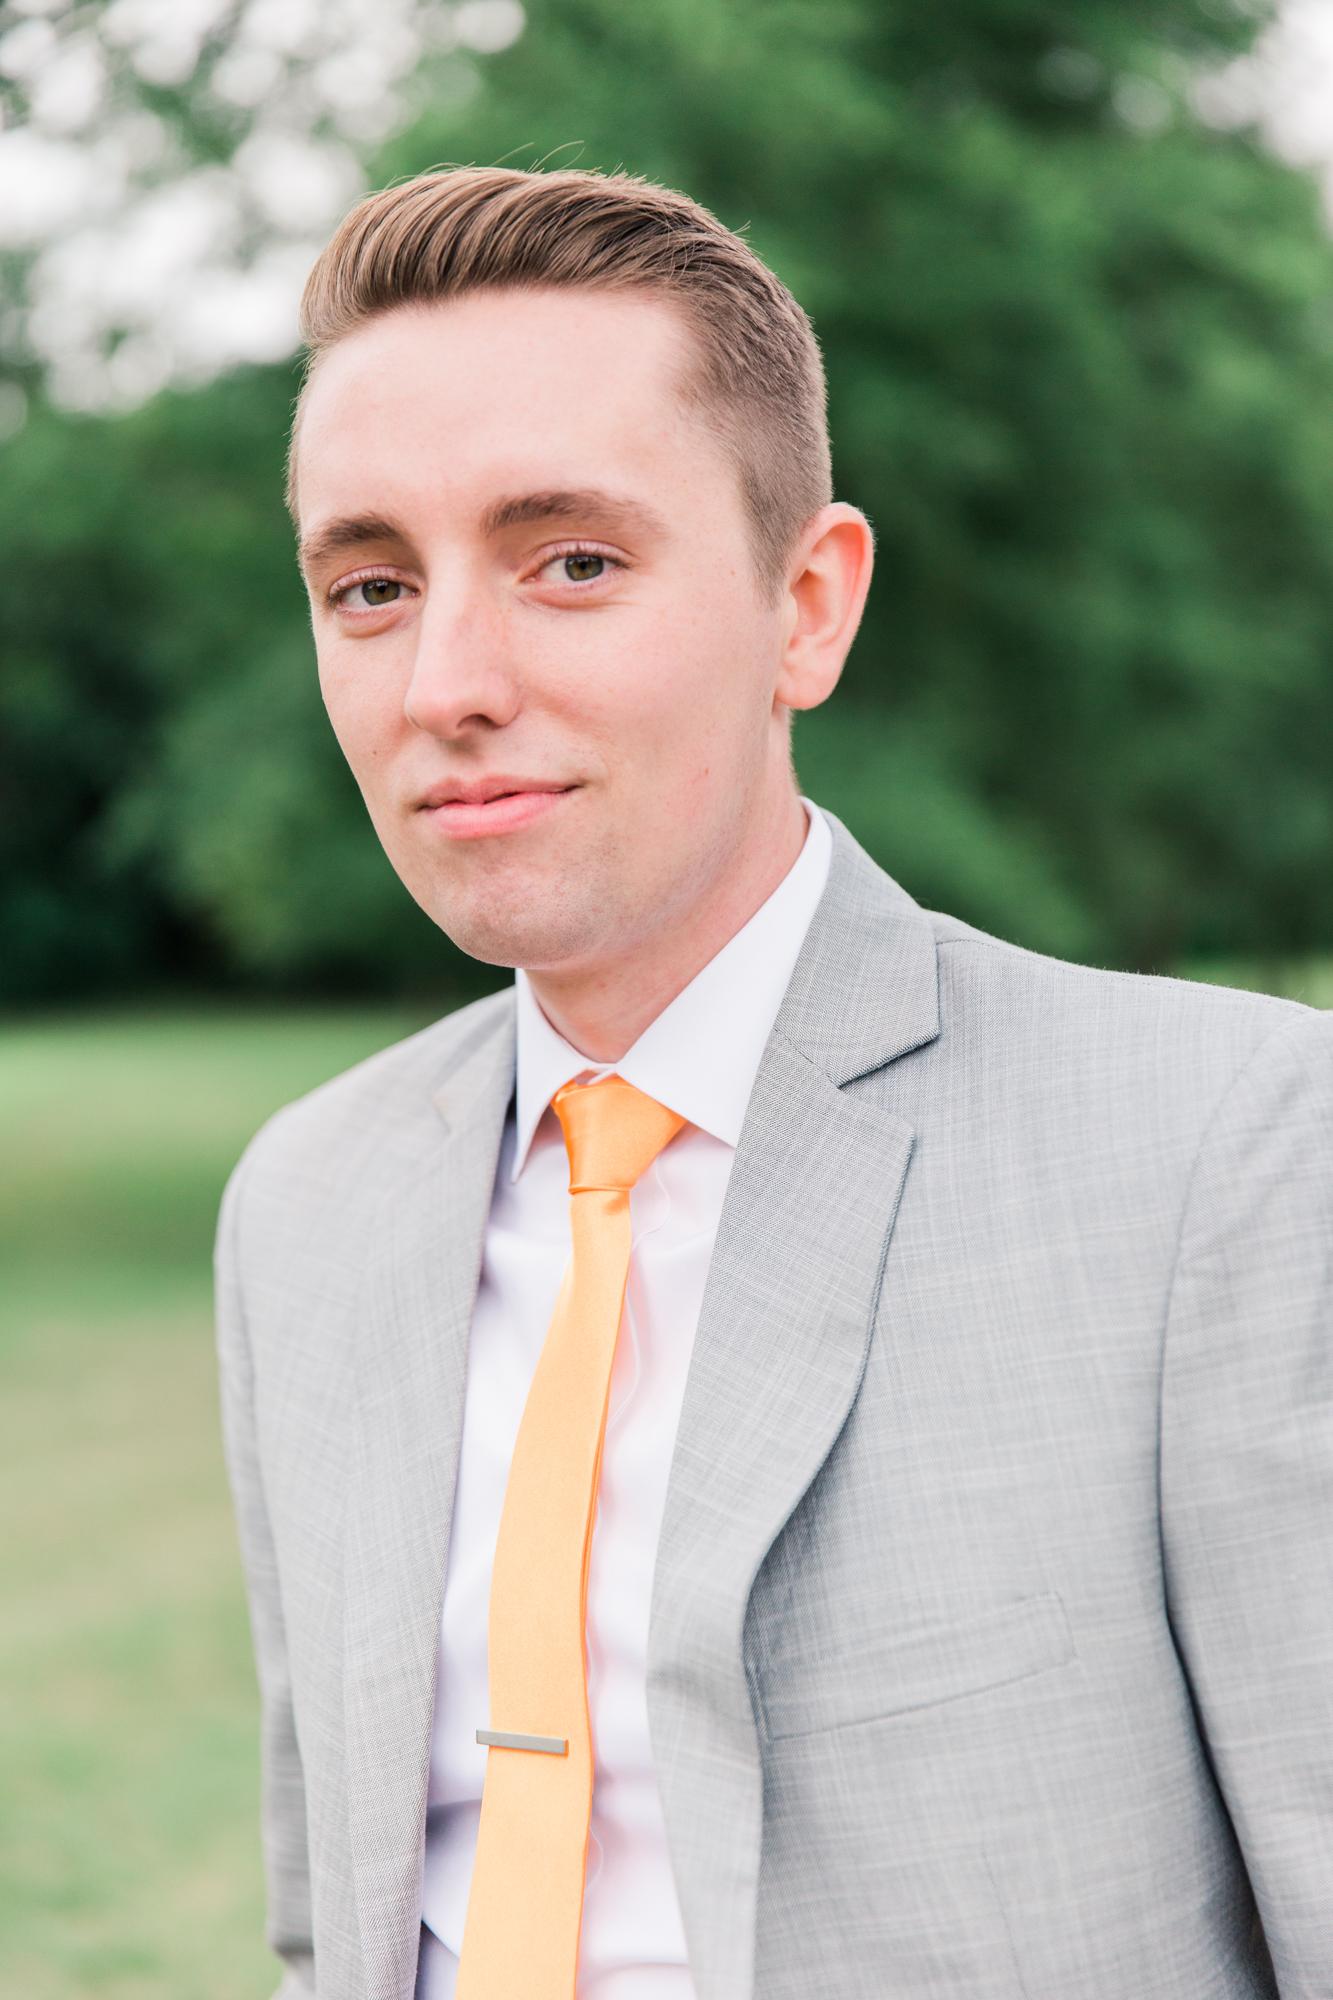 Minnesota Wedding Photographer| Sierra & Jacob | LDS Photographer | Fine Art | Groom |Eden & Me Photography